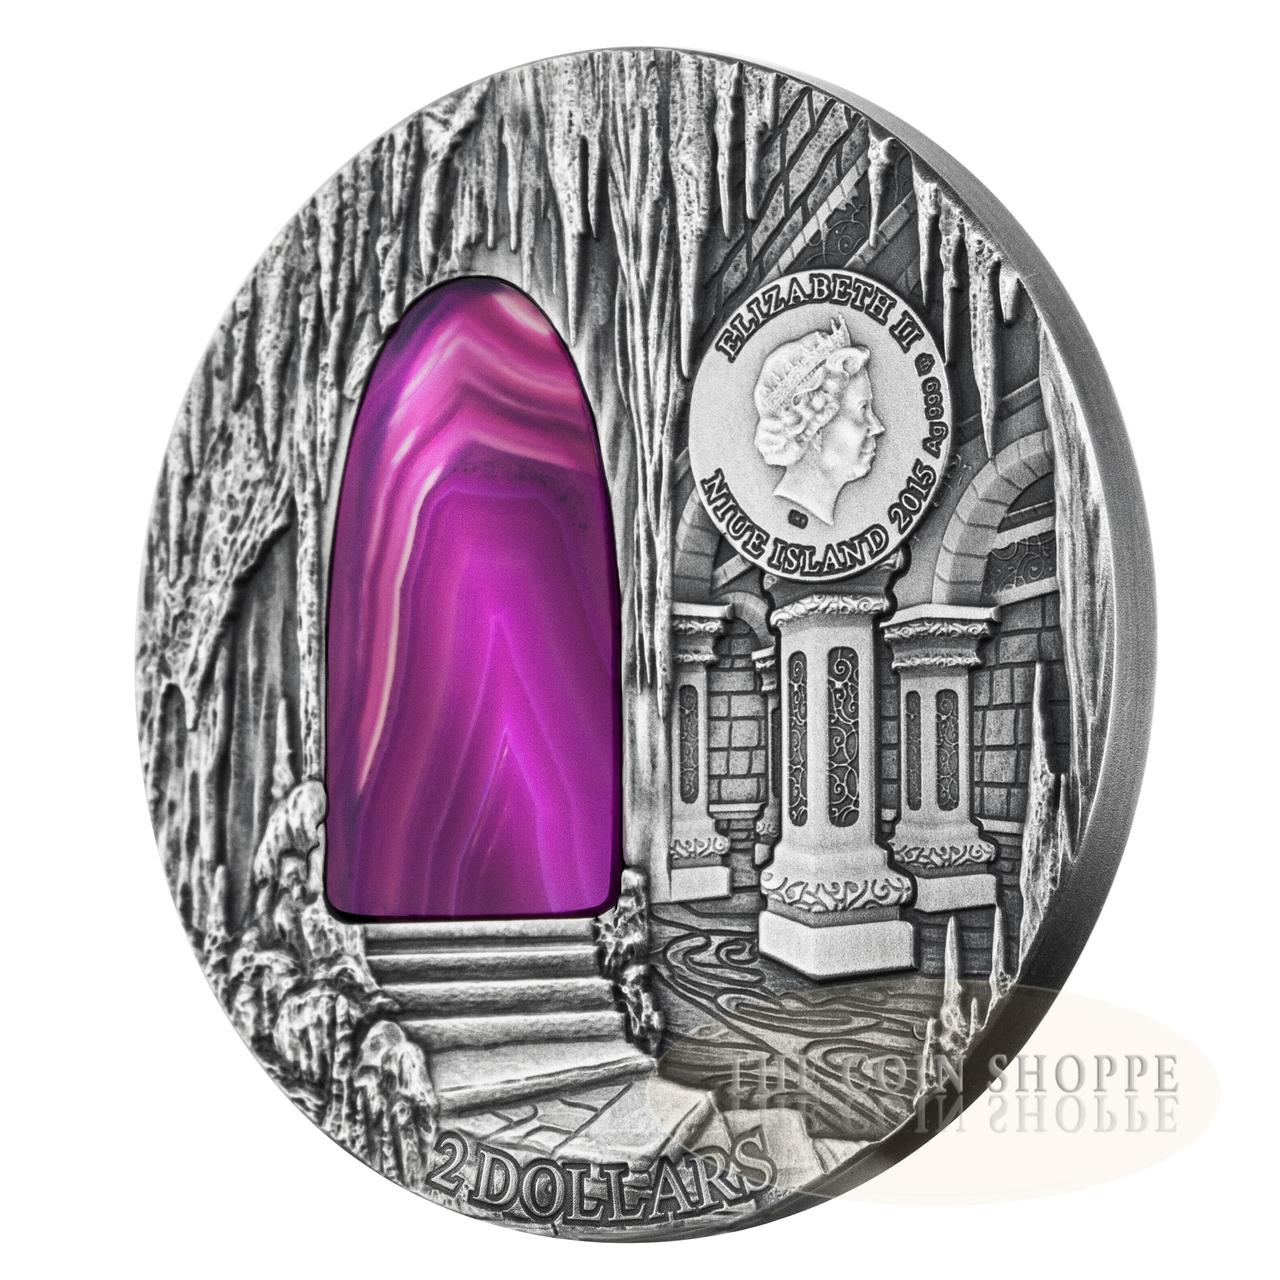 2 $ 2015 Niue Island Mysteries Of Hogwarts Special Buy Crystal Art Iv